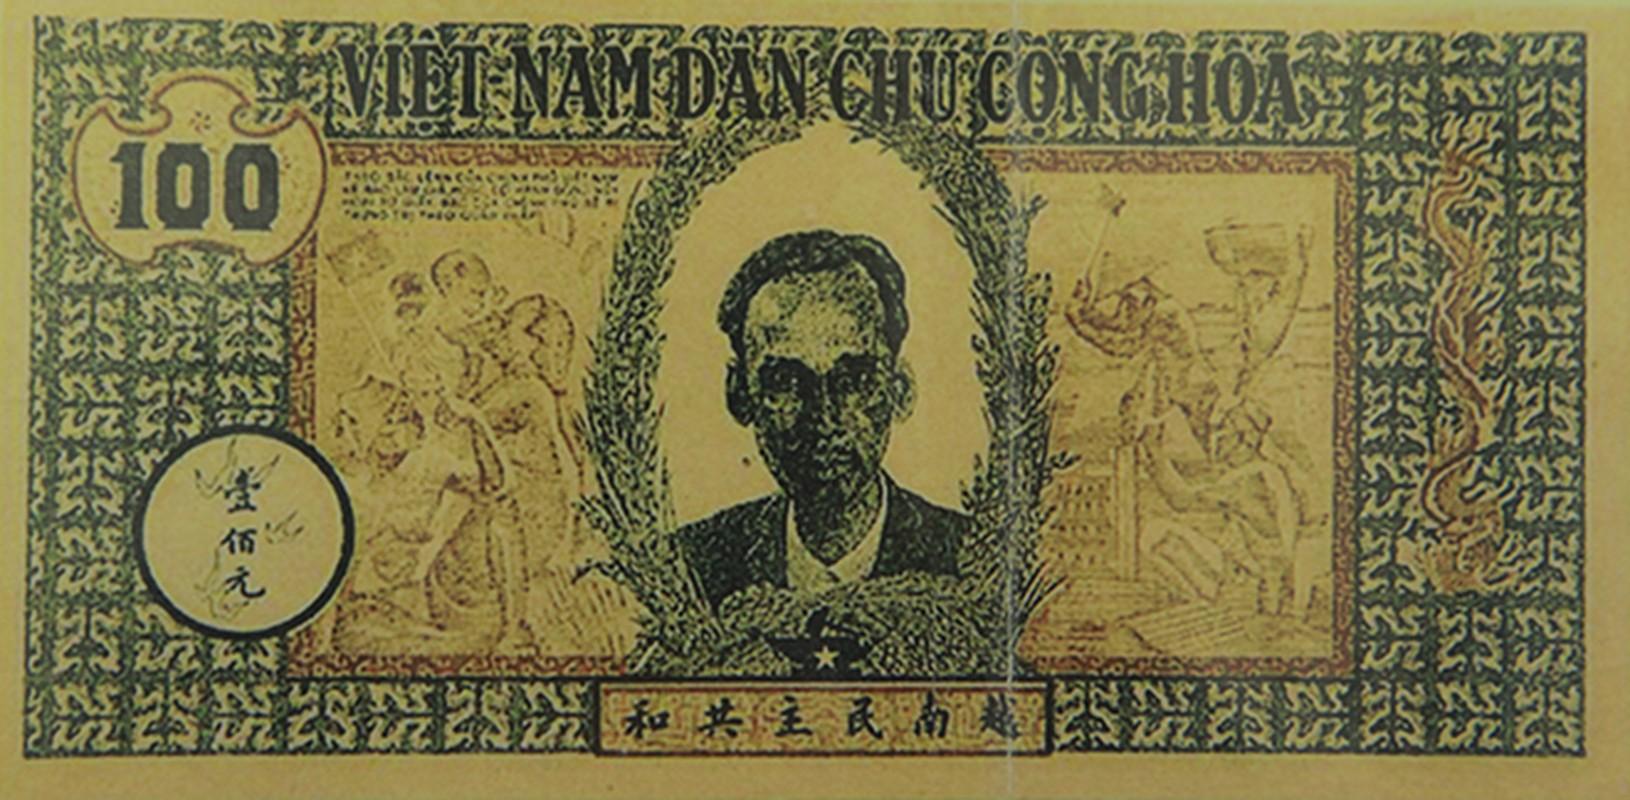 Chuyen it biet ve nha may in tien dau tien cua Viet Nam-Hinh-6